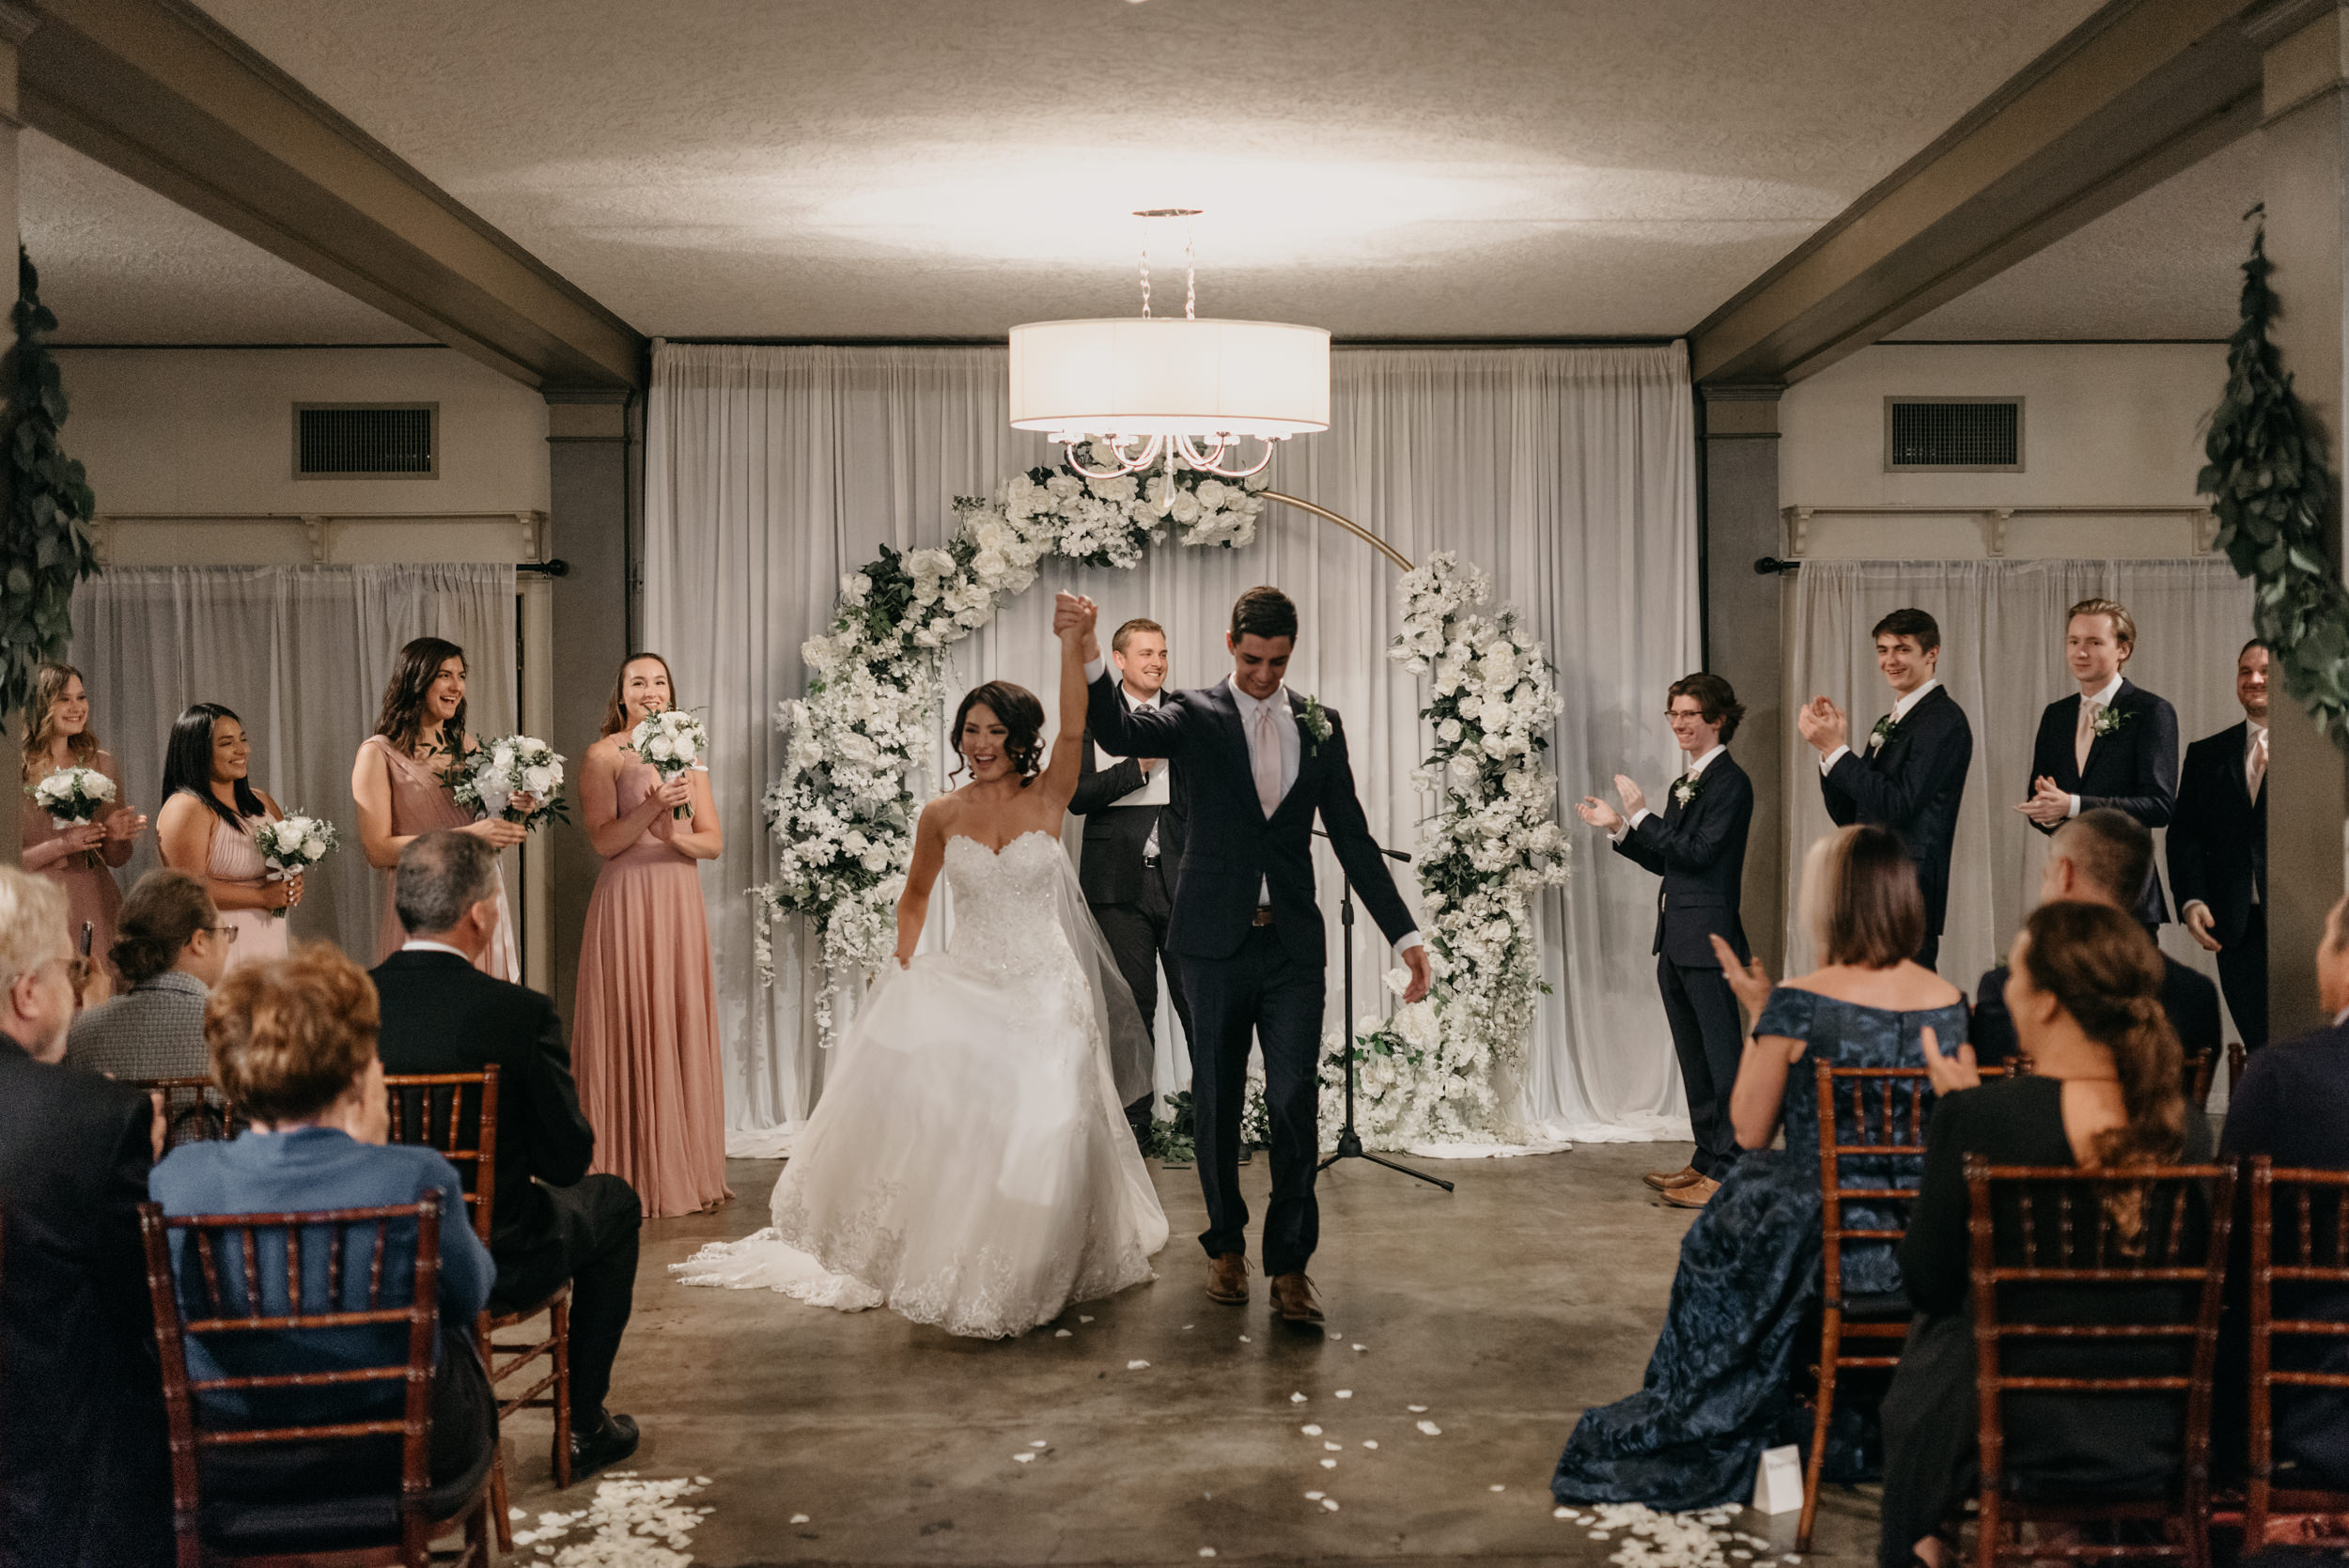 99-ceremony-west-end-ballroom-portland-wedding-venue-8069.jpg